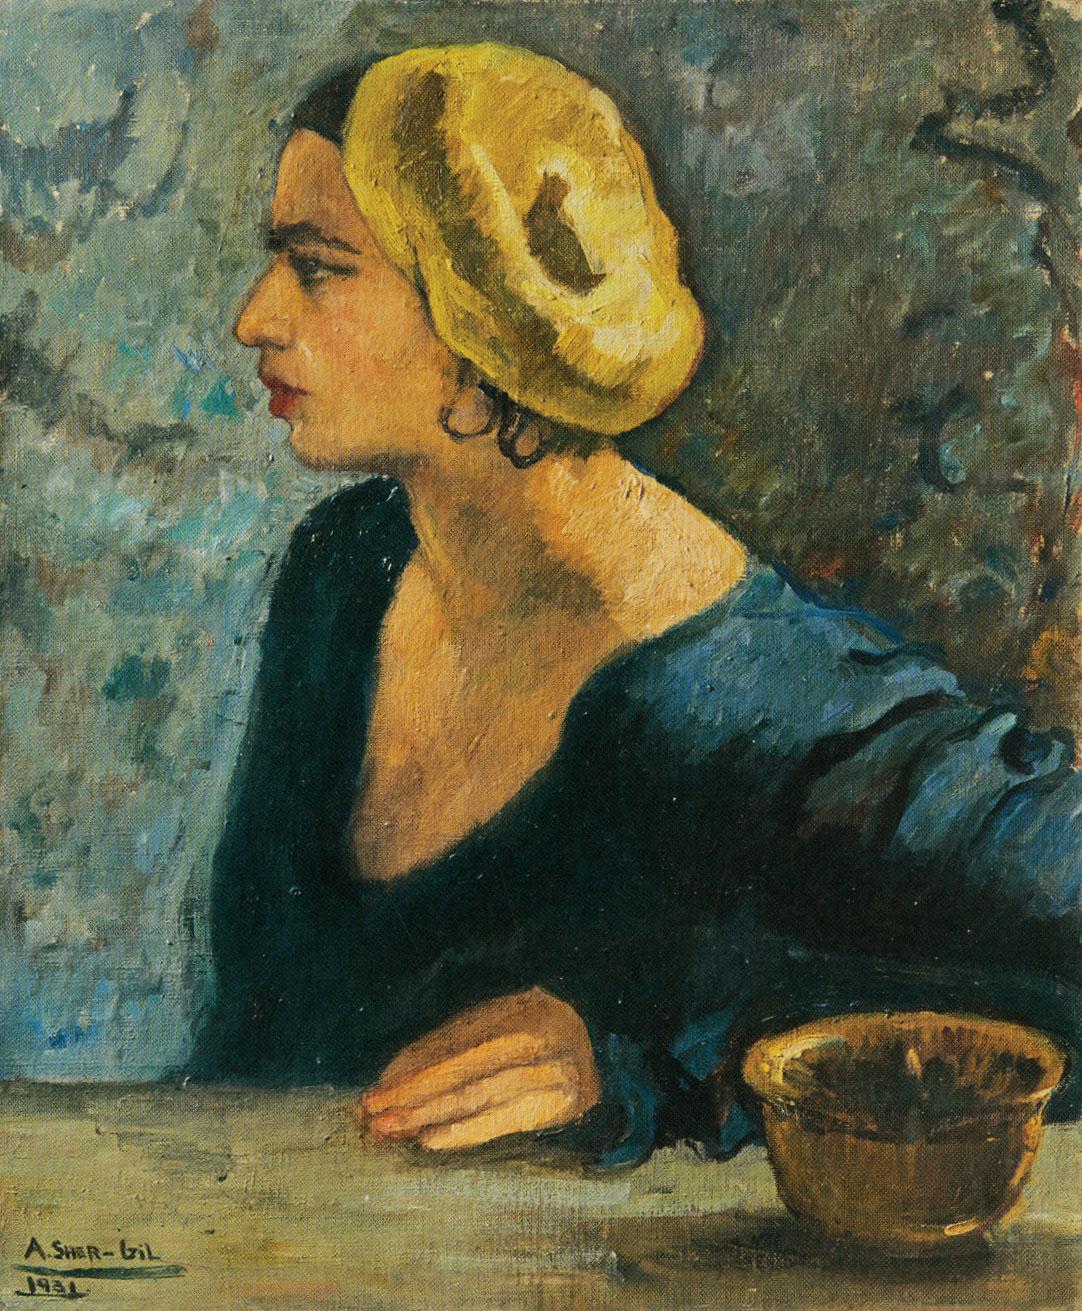 Untitled Self-Portrait, 1931 by Amrita Sher-Gil